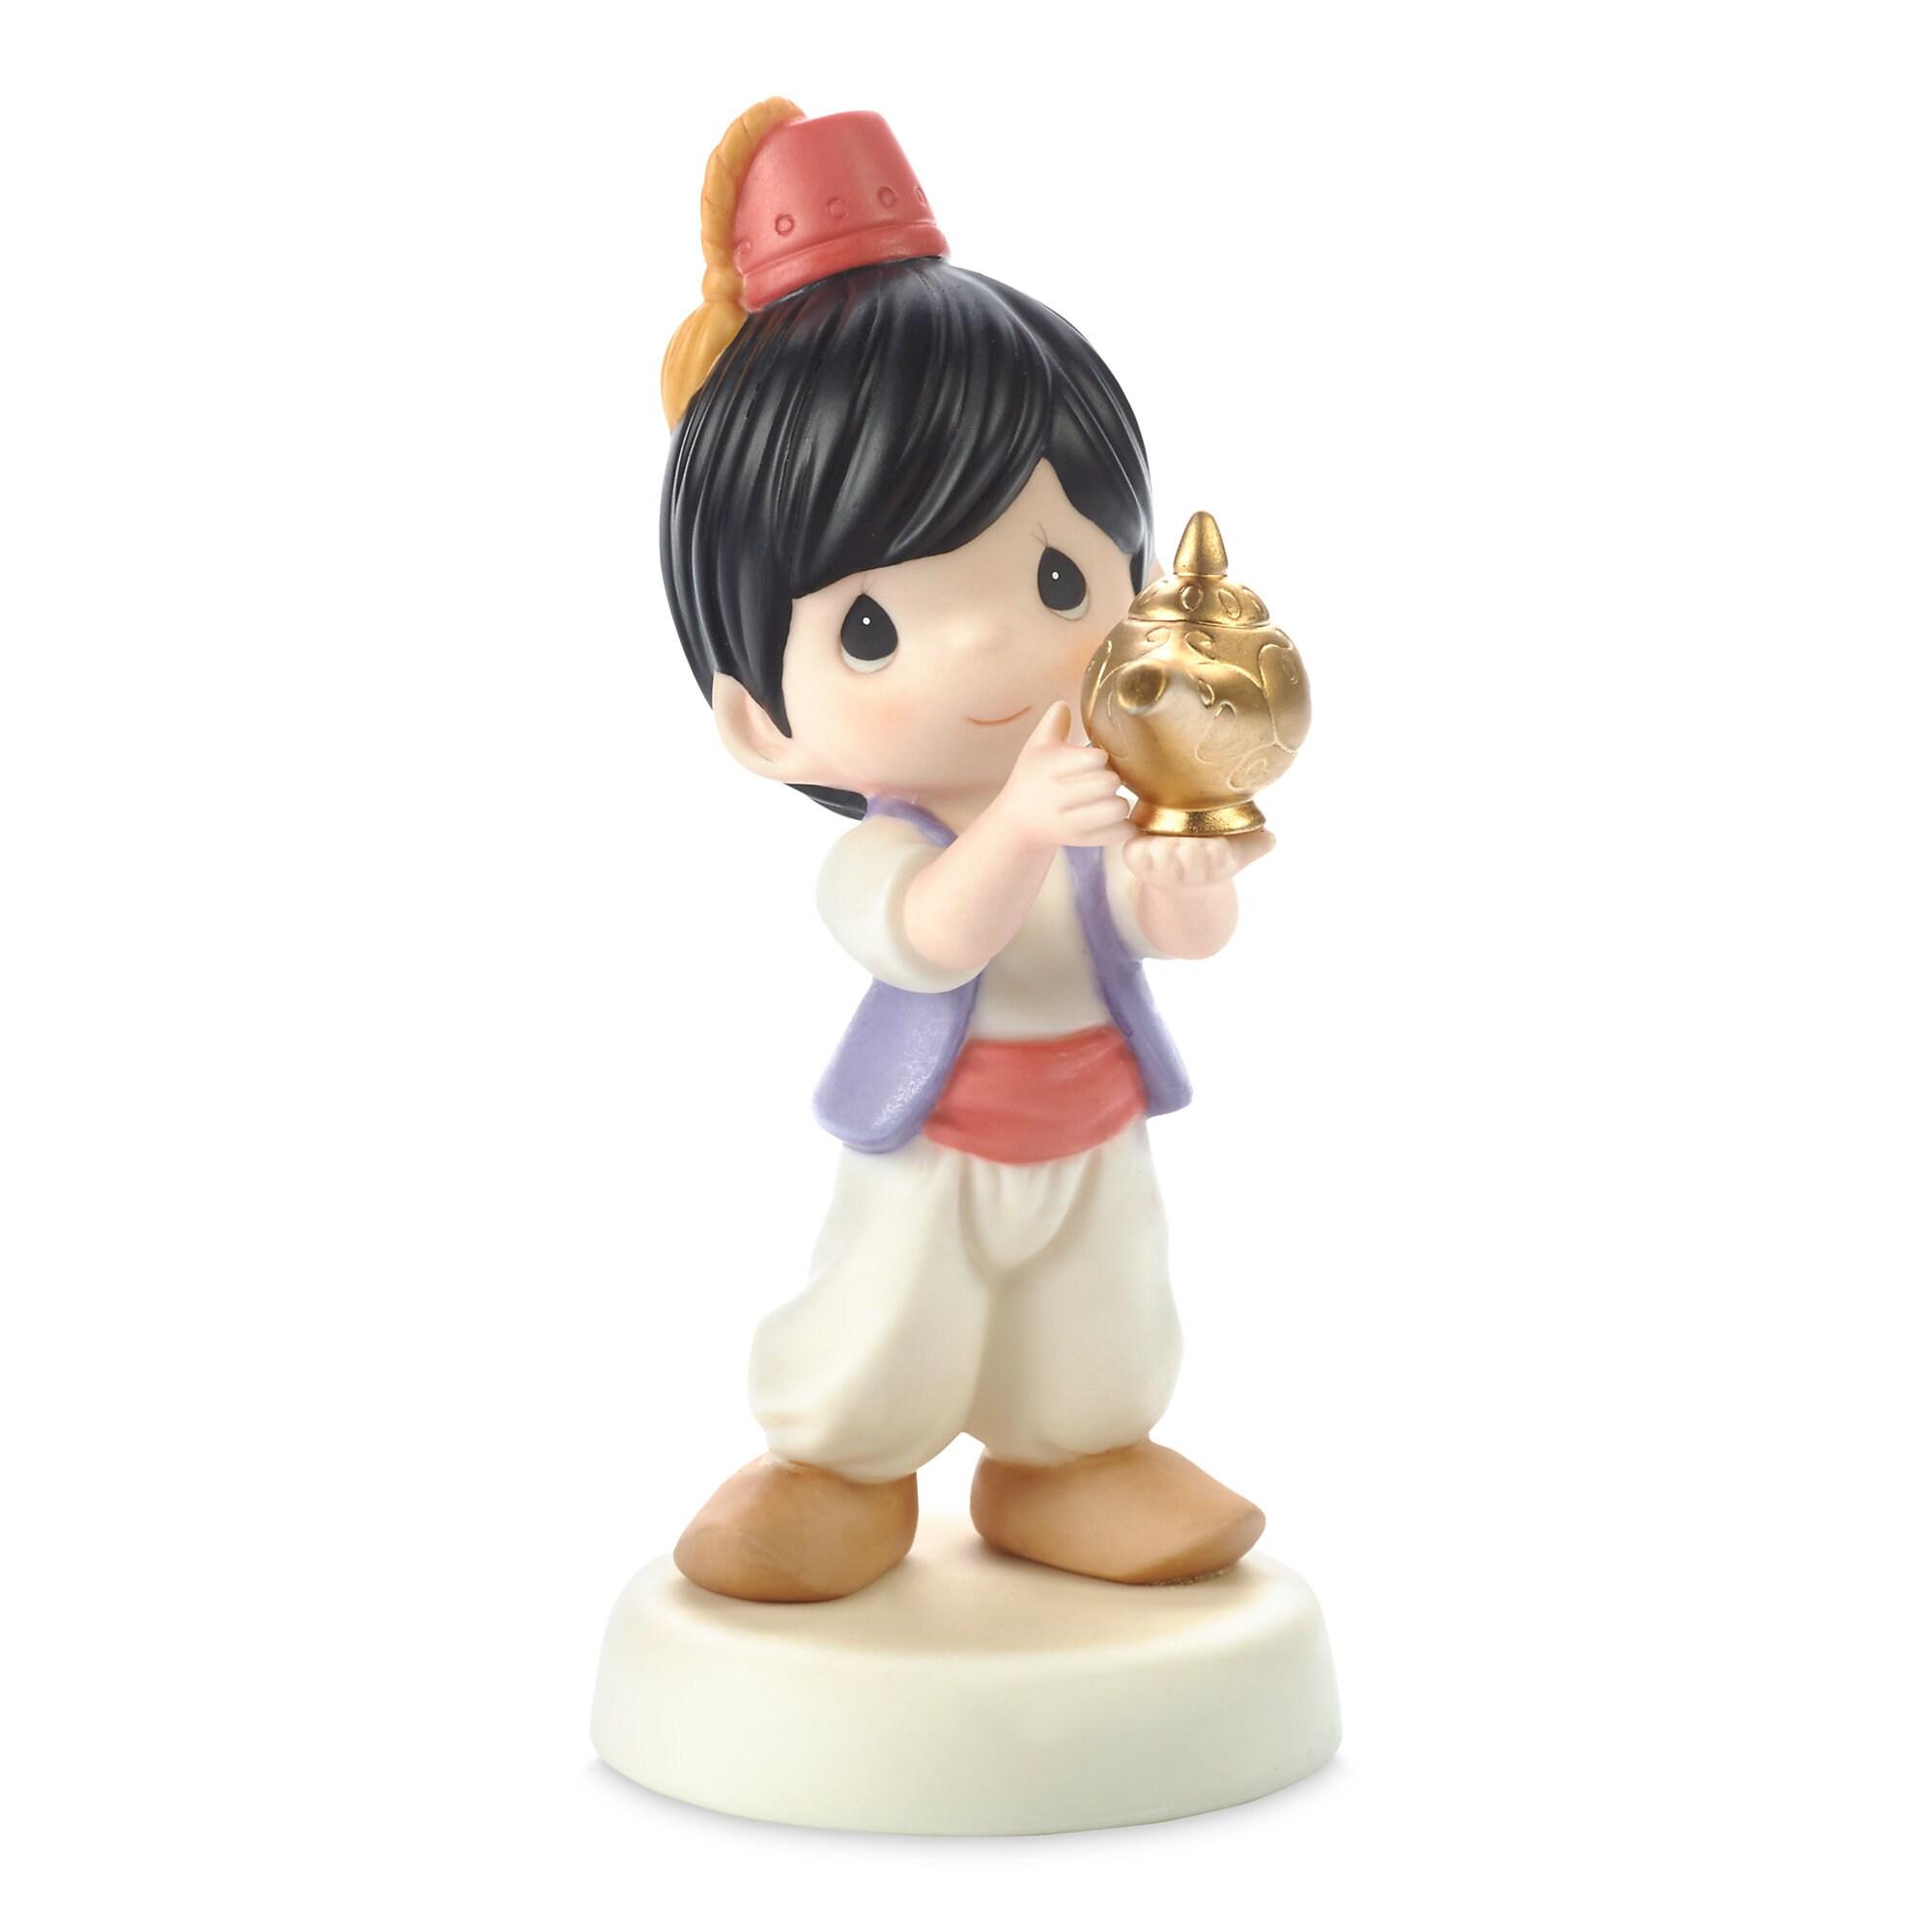 Aladdin with Magic Lamp Figure by Precious Moments